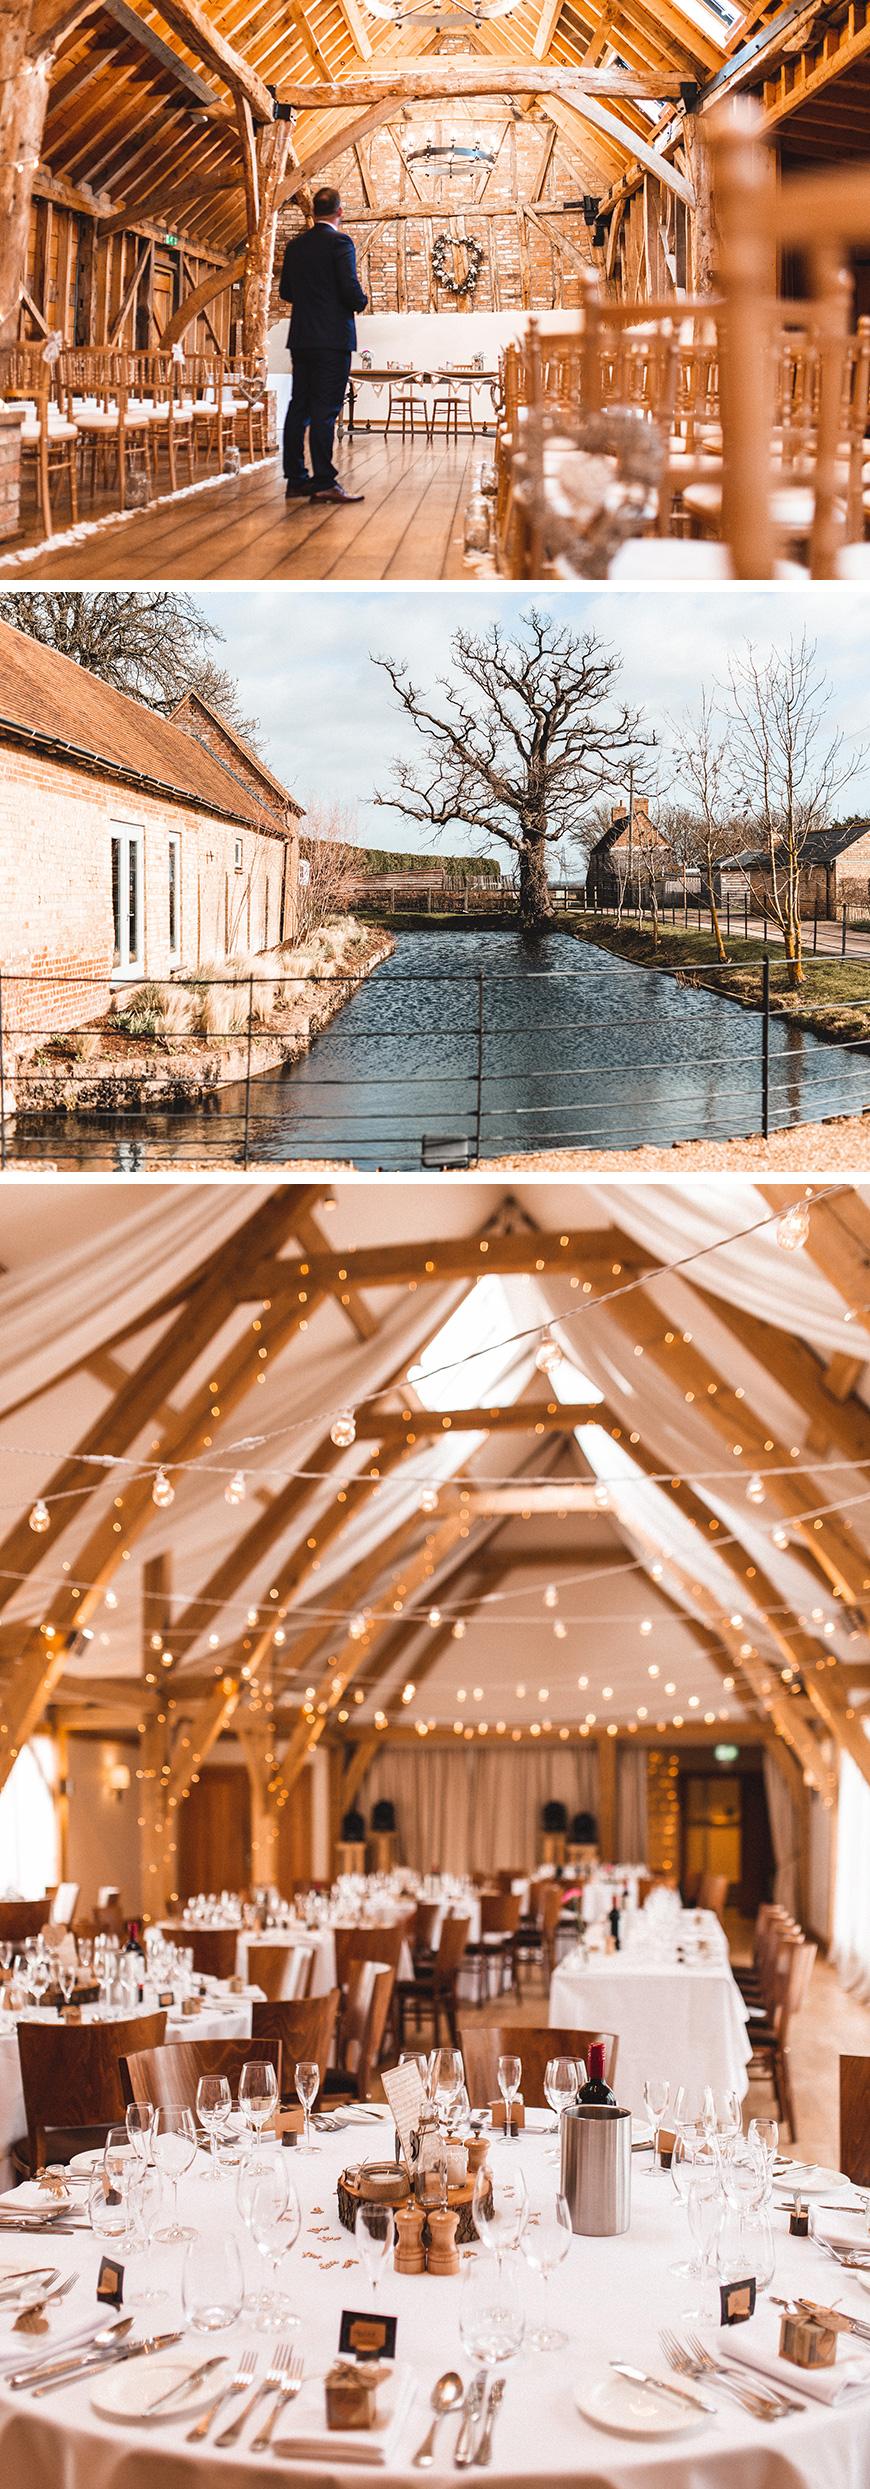 Real Wedding - Hayley and Ben's Rustic Wedding at Bassmead Manor Barns | CHWV